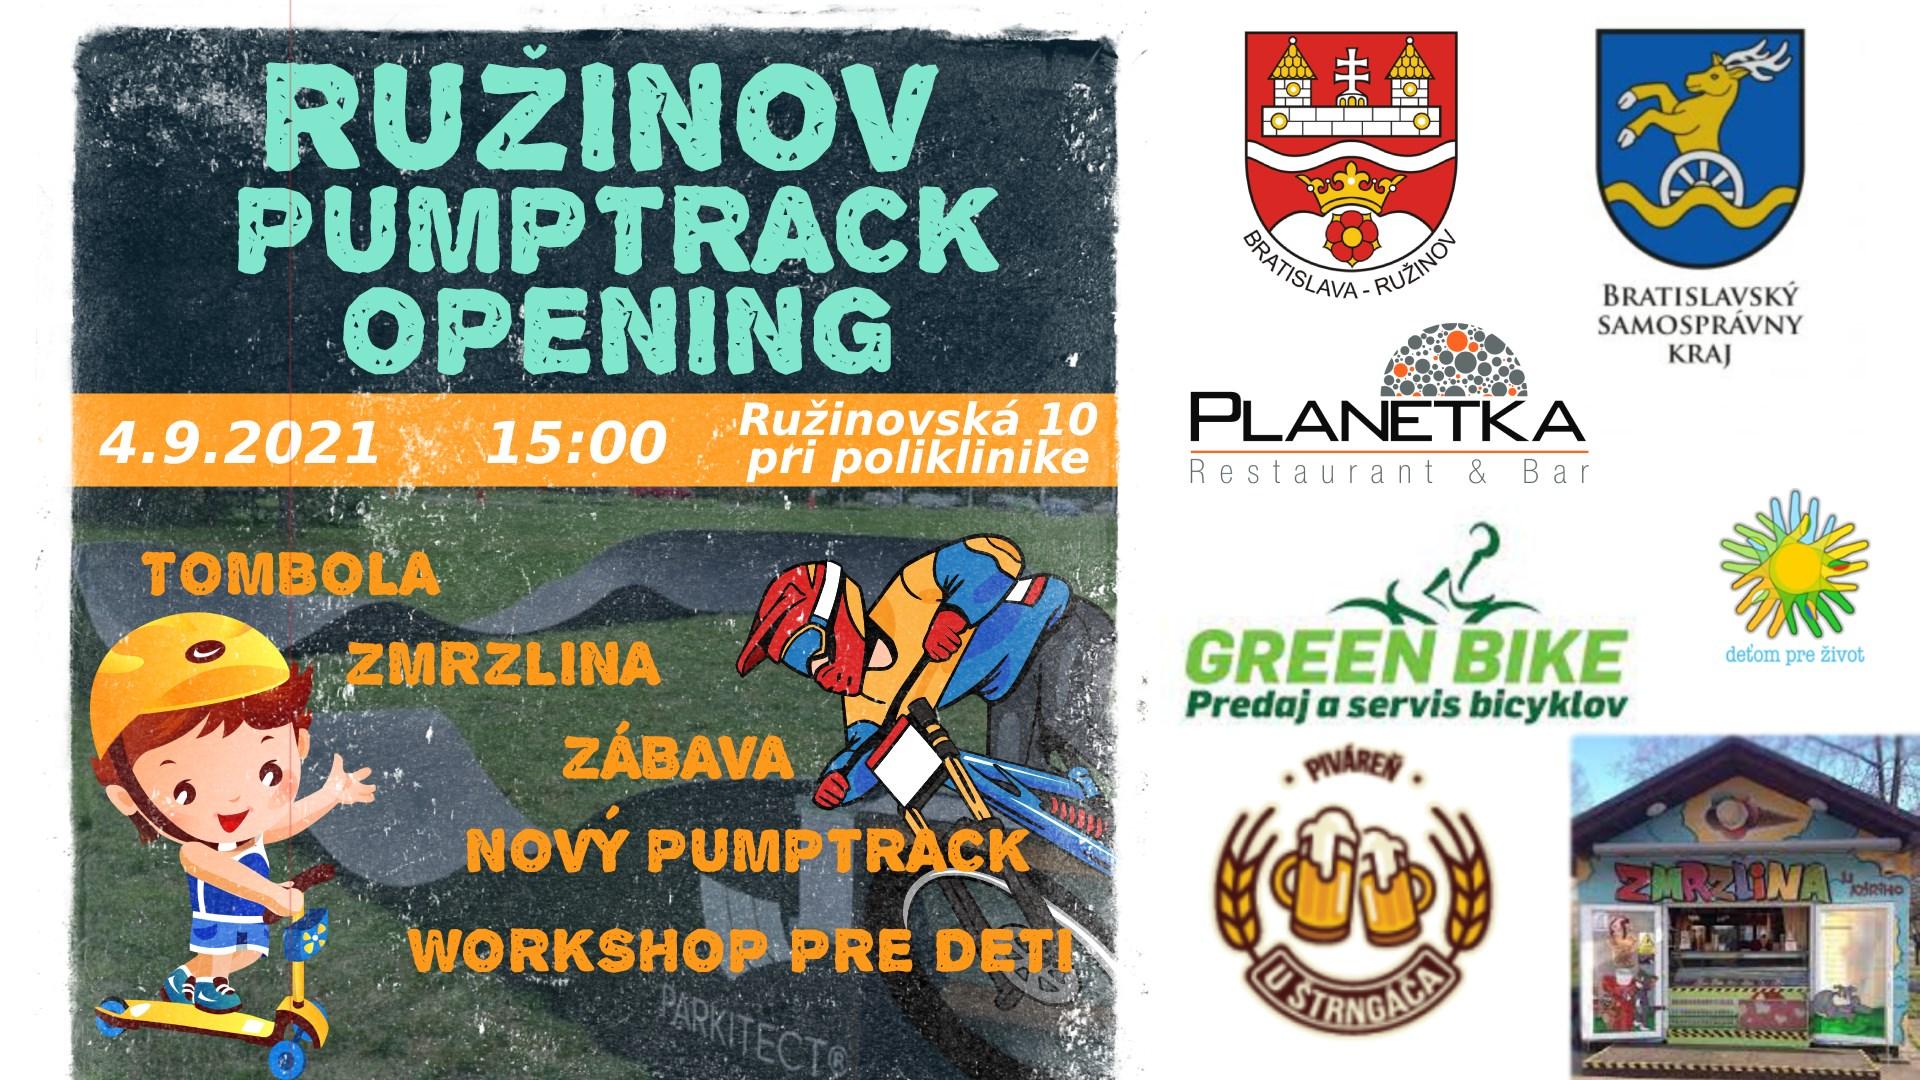 Ružinov Pumptrack Opening - 4.9.2021 o 15:00, pri Poliklinike v Ružinove